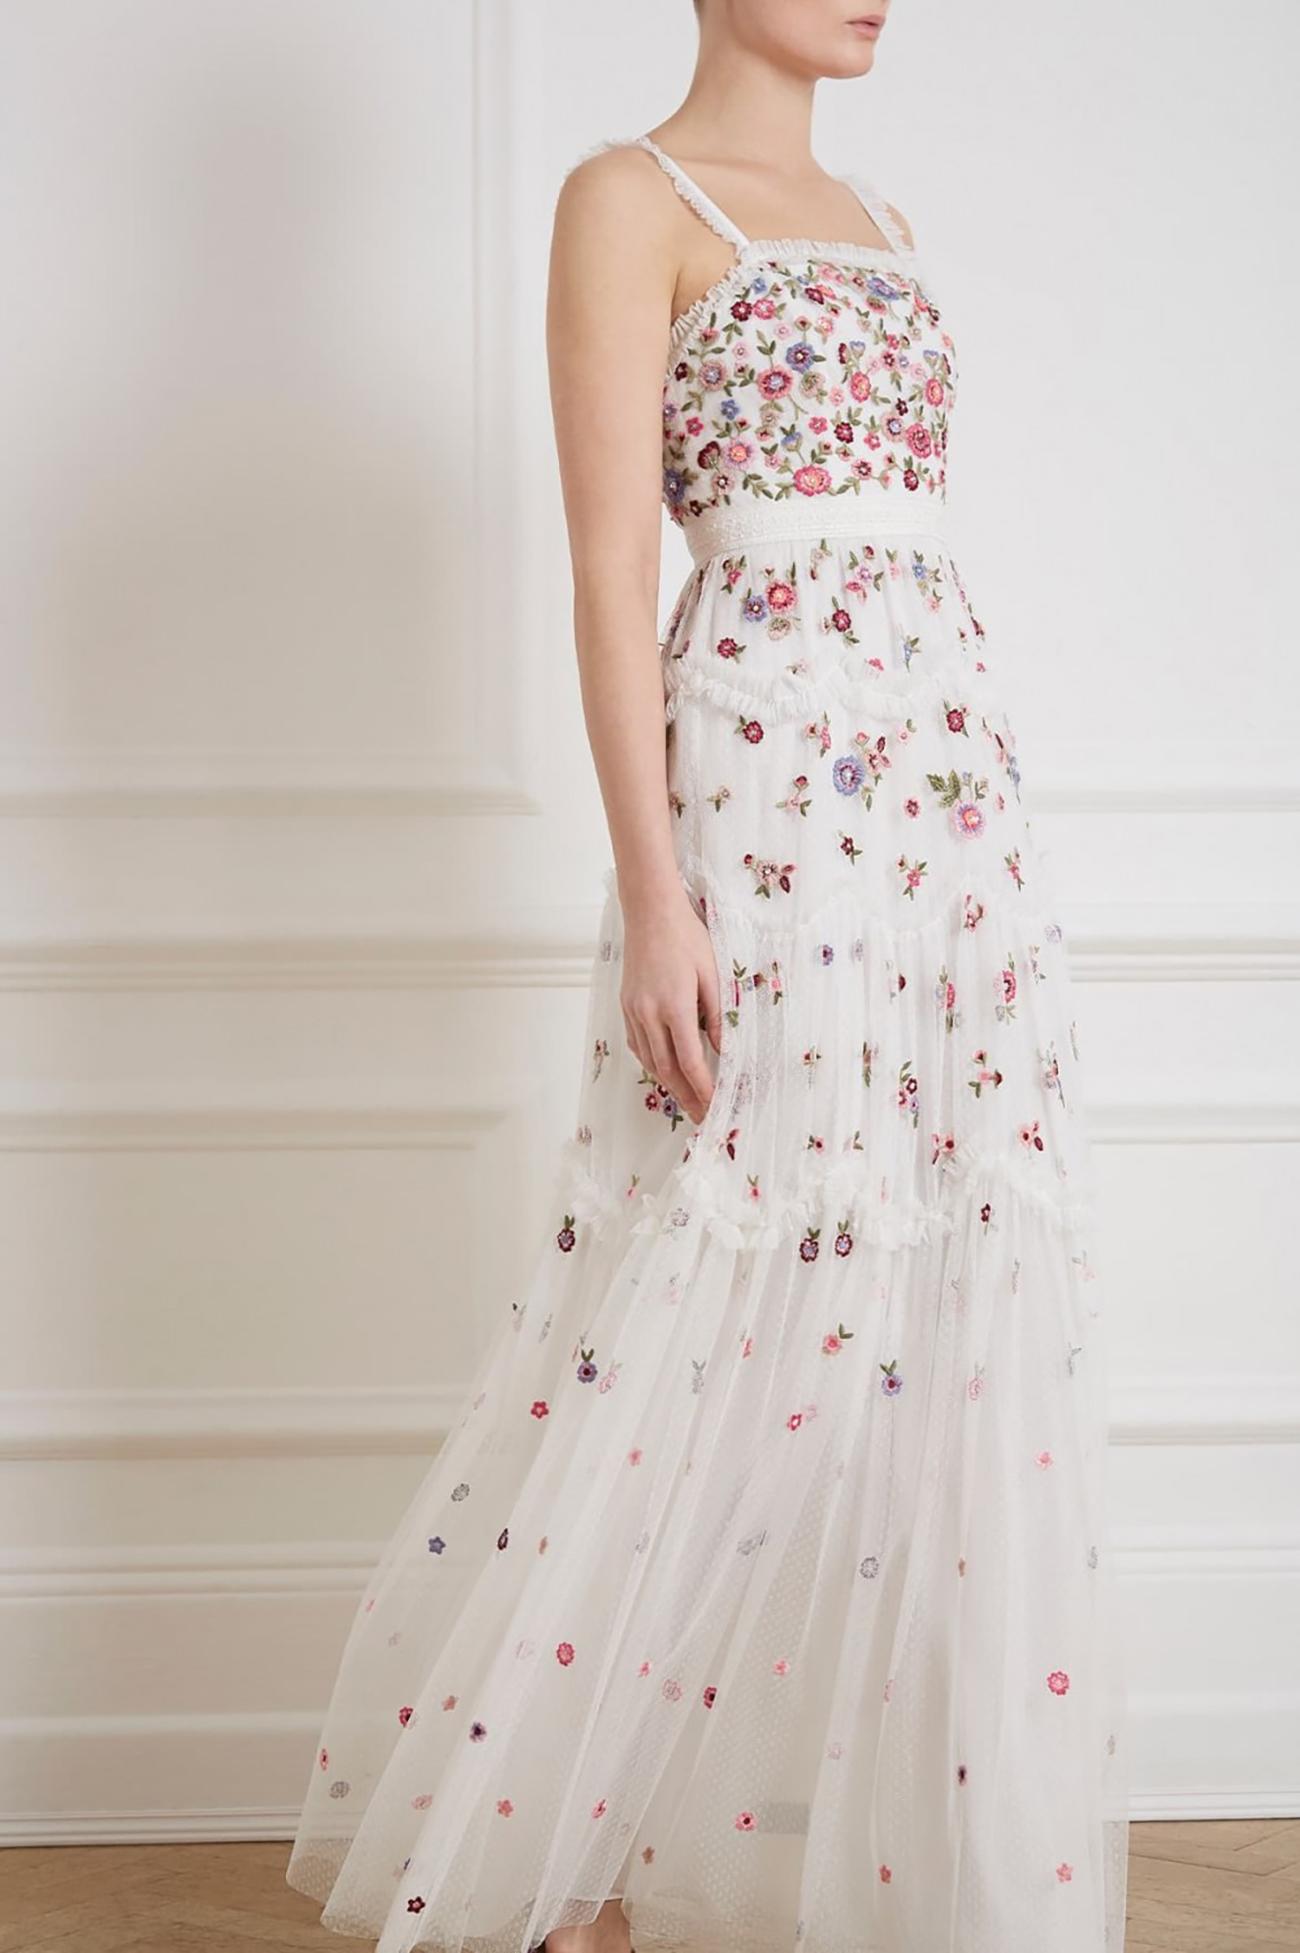 Floral Wedding Dress Under $800 Budget